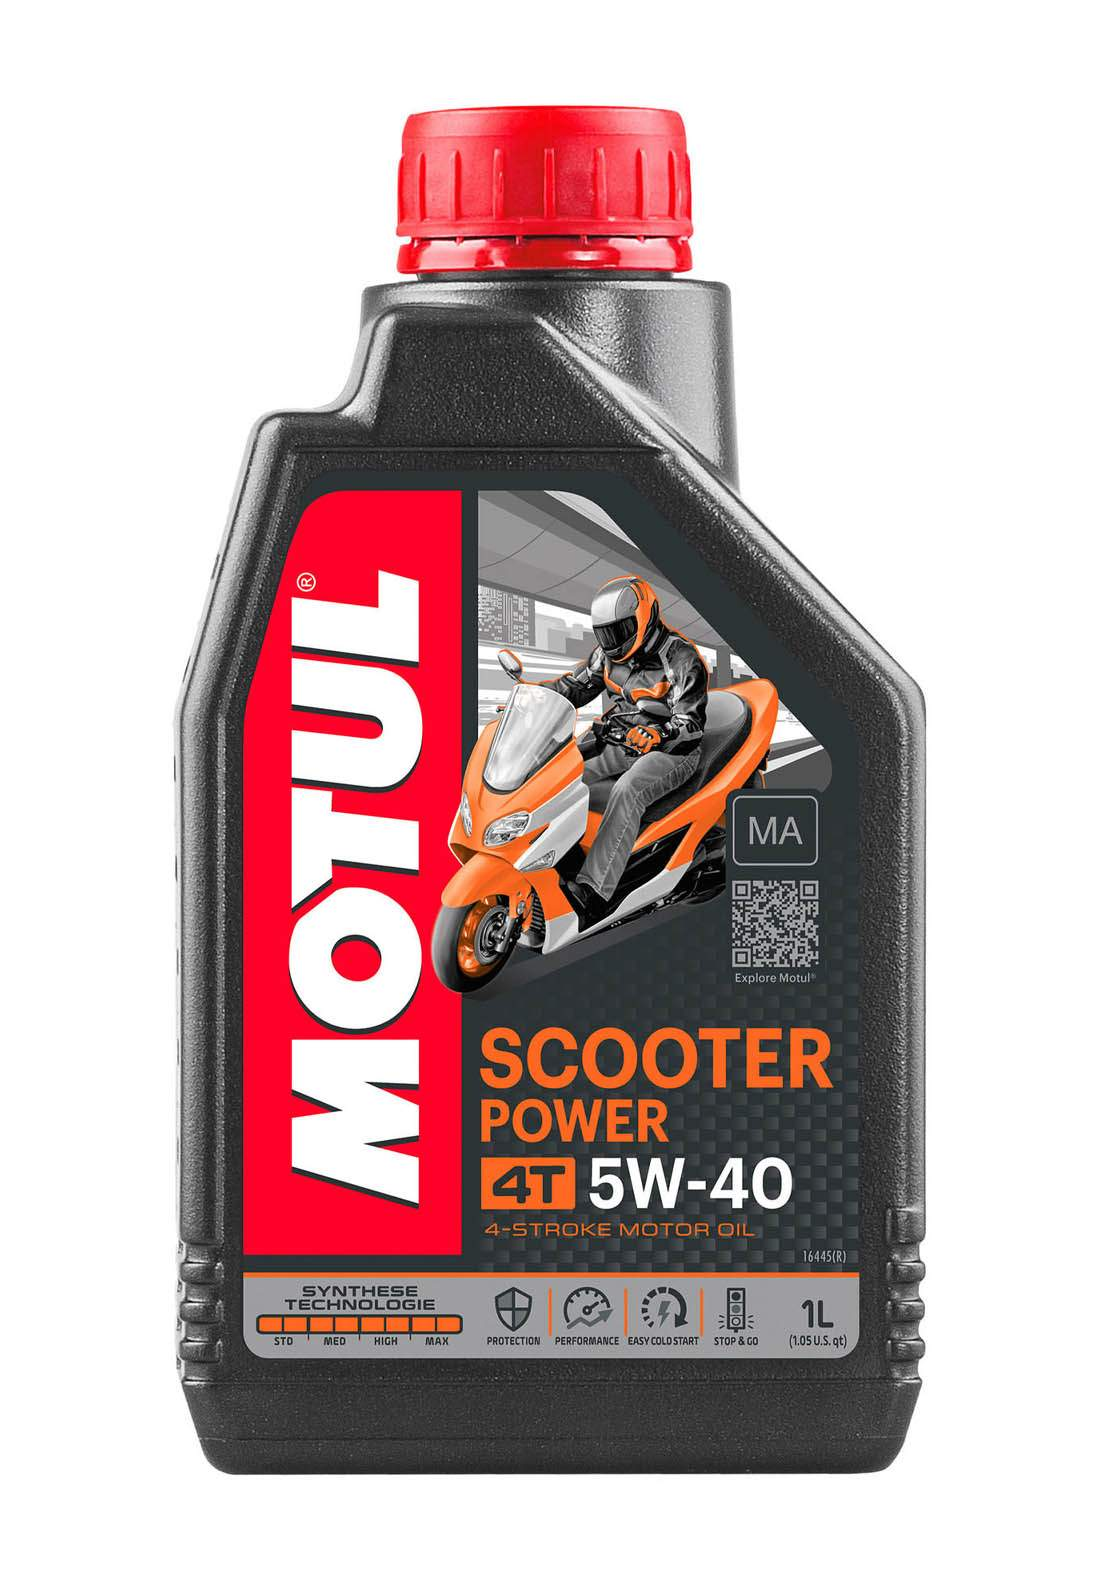 Motul 5w40 Scooter Power Fully Synthetic Oil 1 L زيت محرك الدراجة النارية